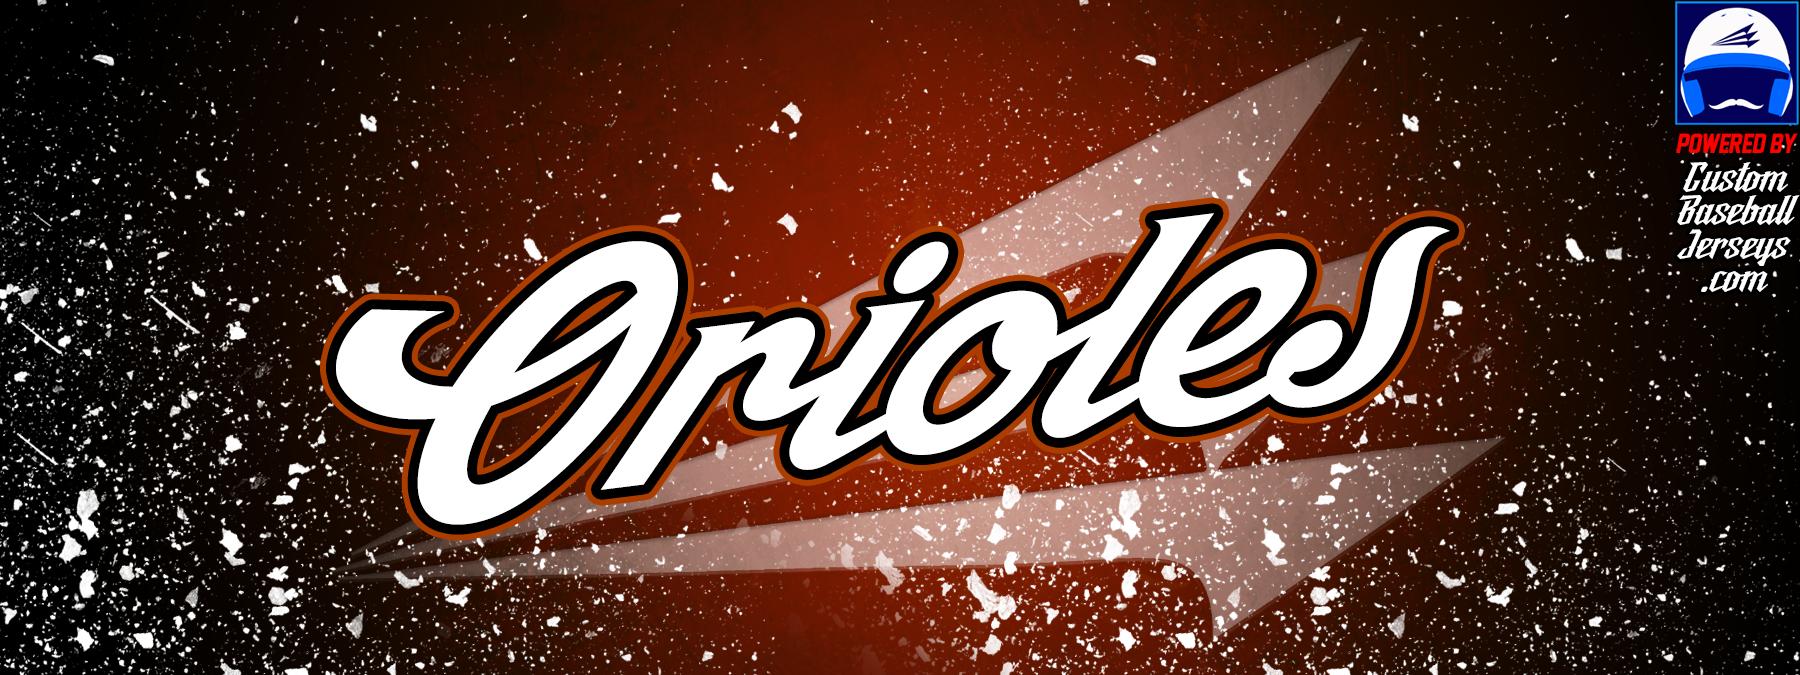 ce2bcfd2a Orioles (Bramlett) Custom Throwback Baseball Jerseys - Custom Baseball  Jerseys.com - The World s  1 Choice for Custom Baseball Uniforms